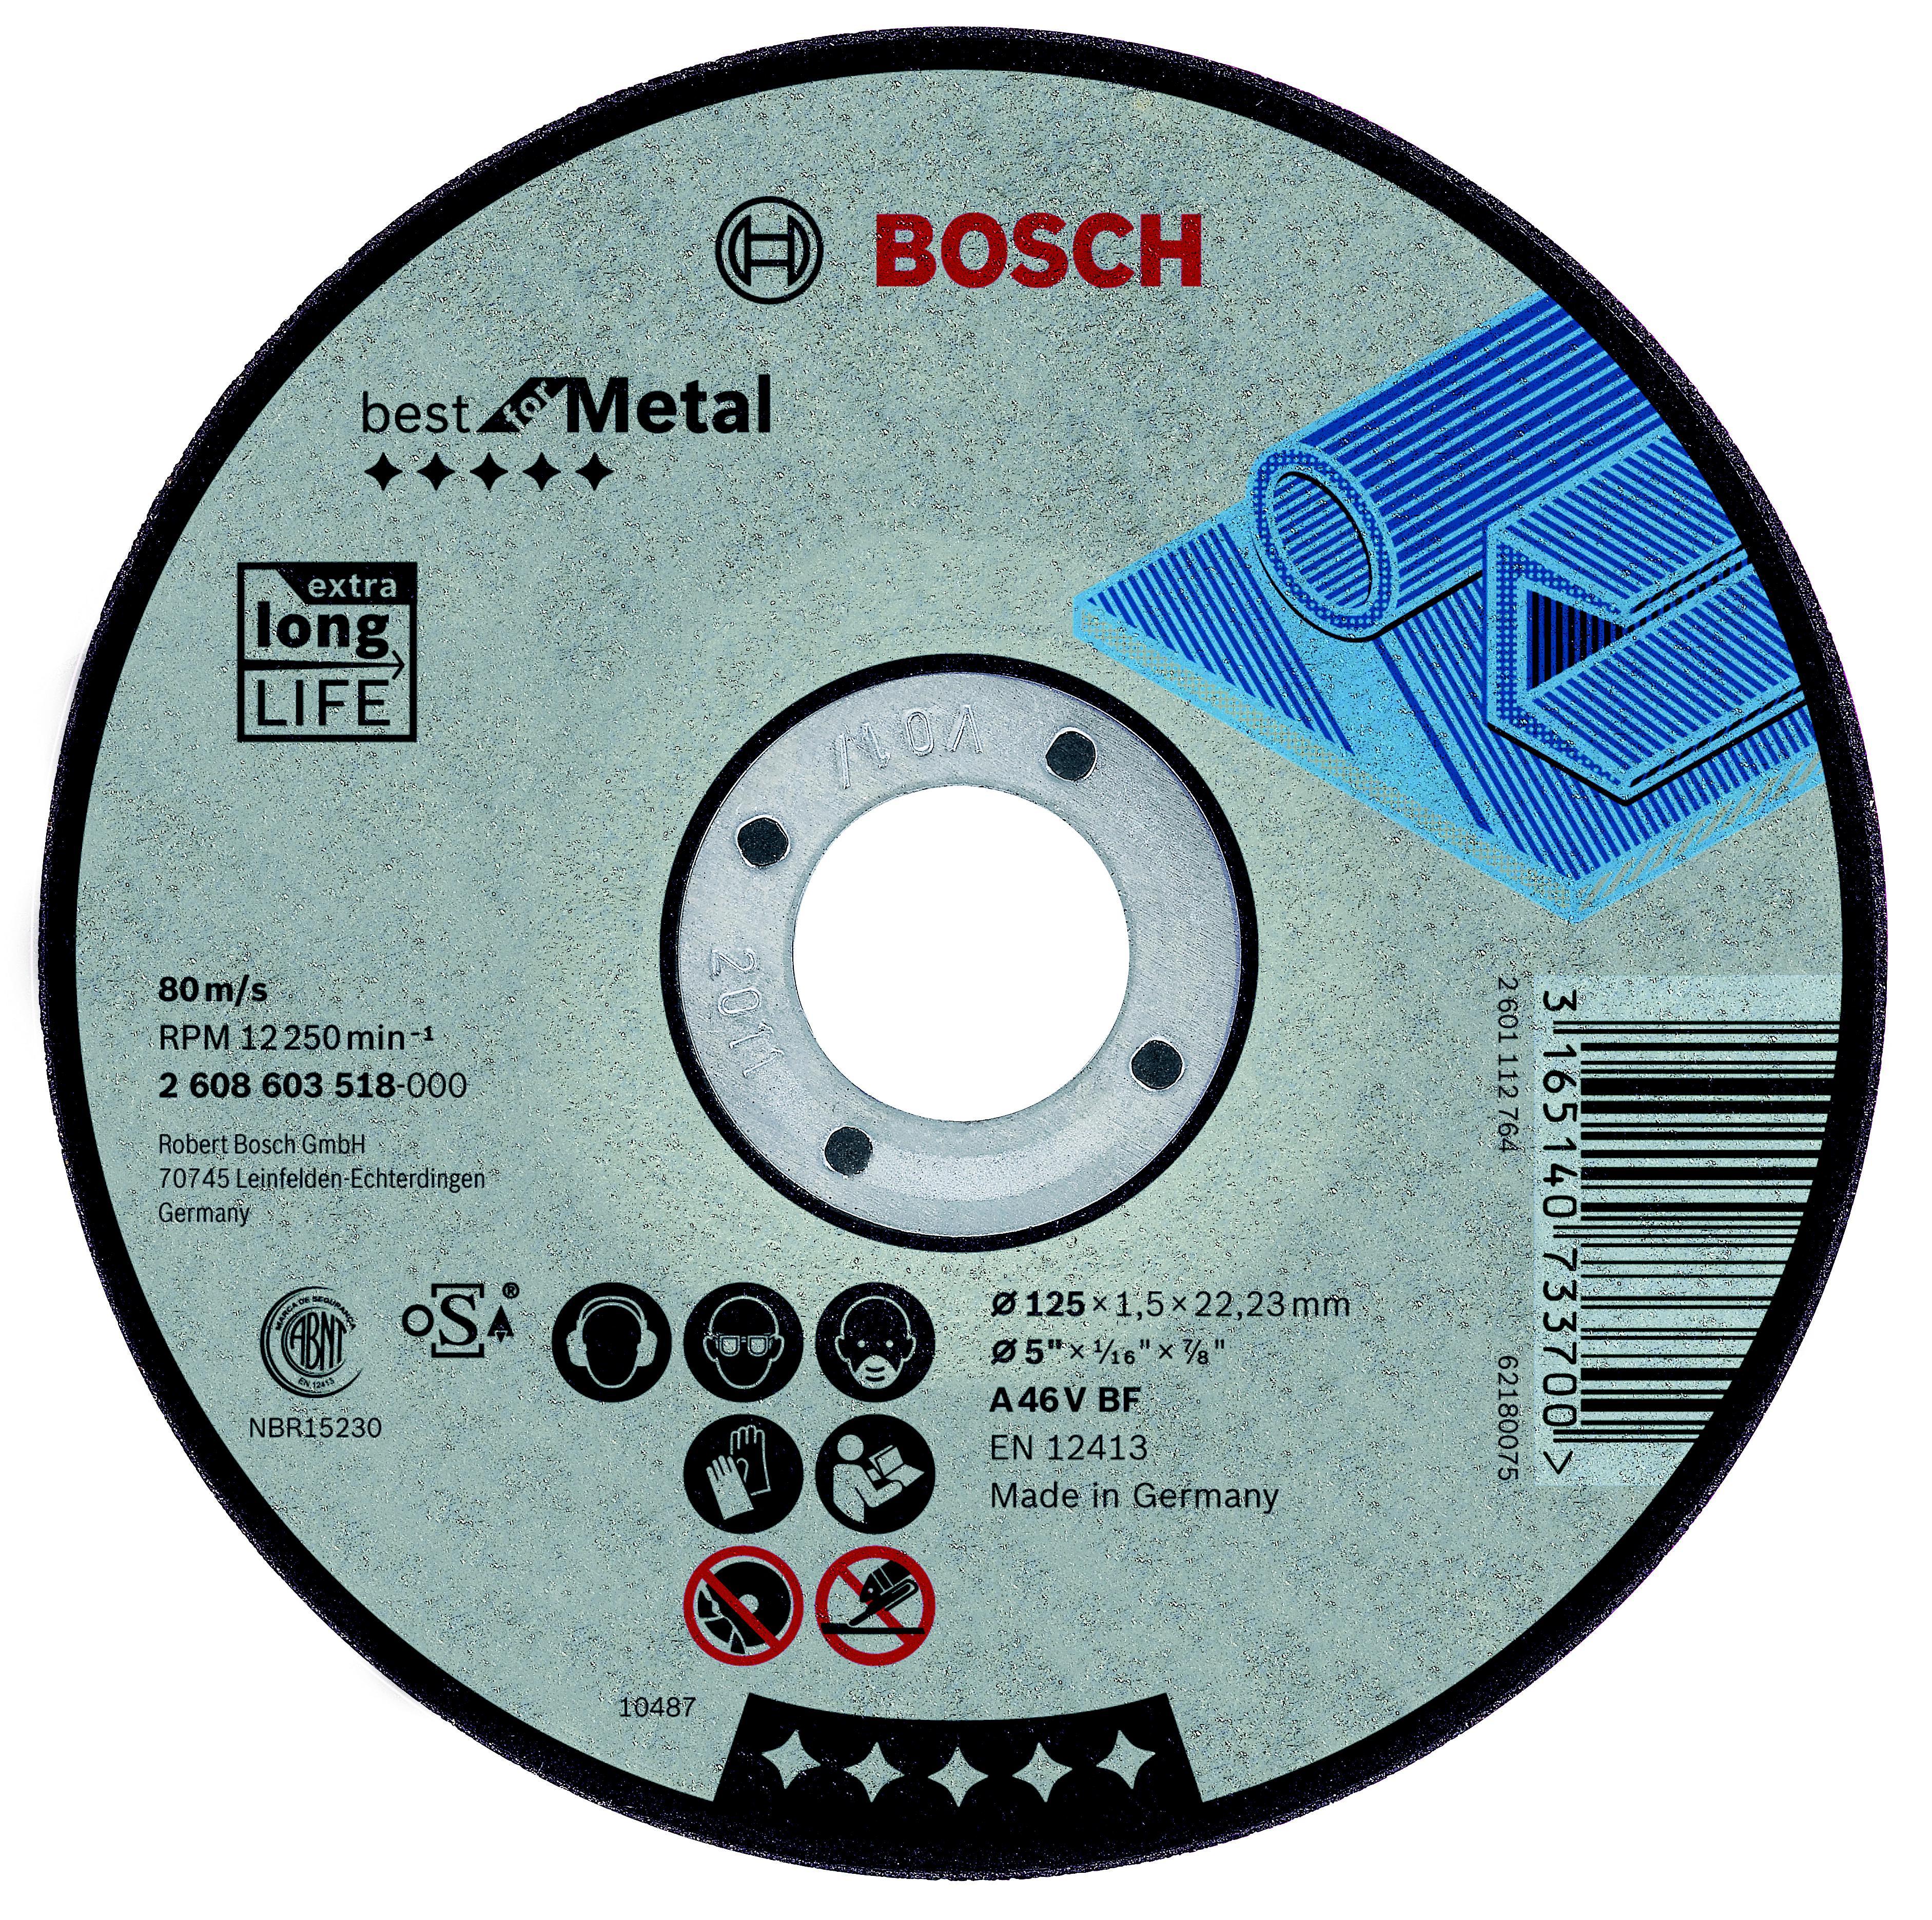 Круг отрезной Bosch 115х2.5х22 best for metal (2.608.603.524) круг отрезной bosch 115х1 5х22 best for metal 2 608 603 517